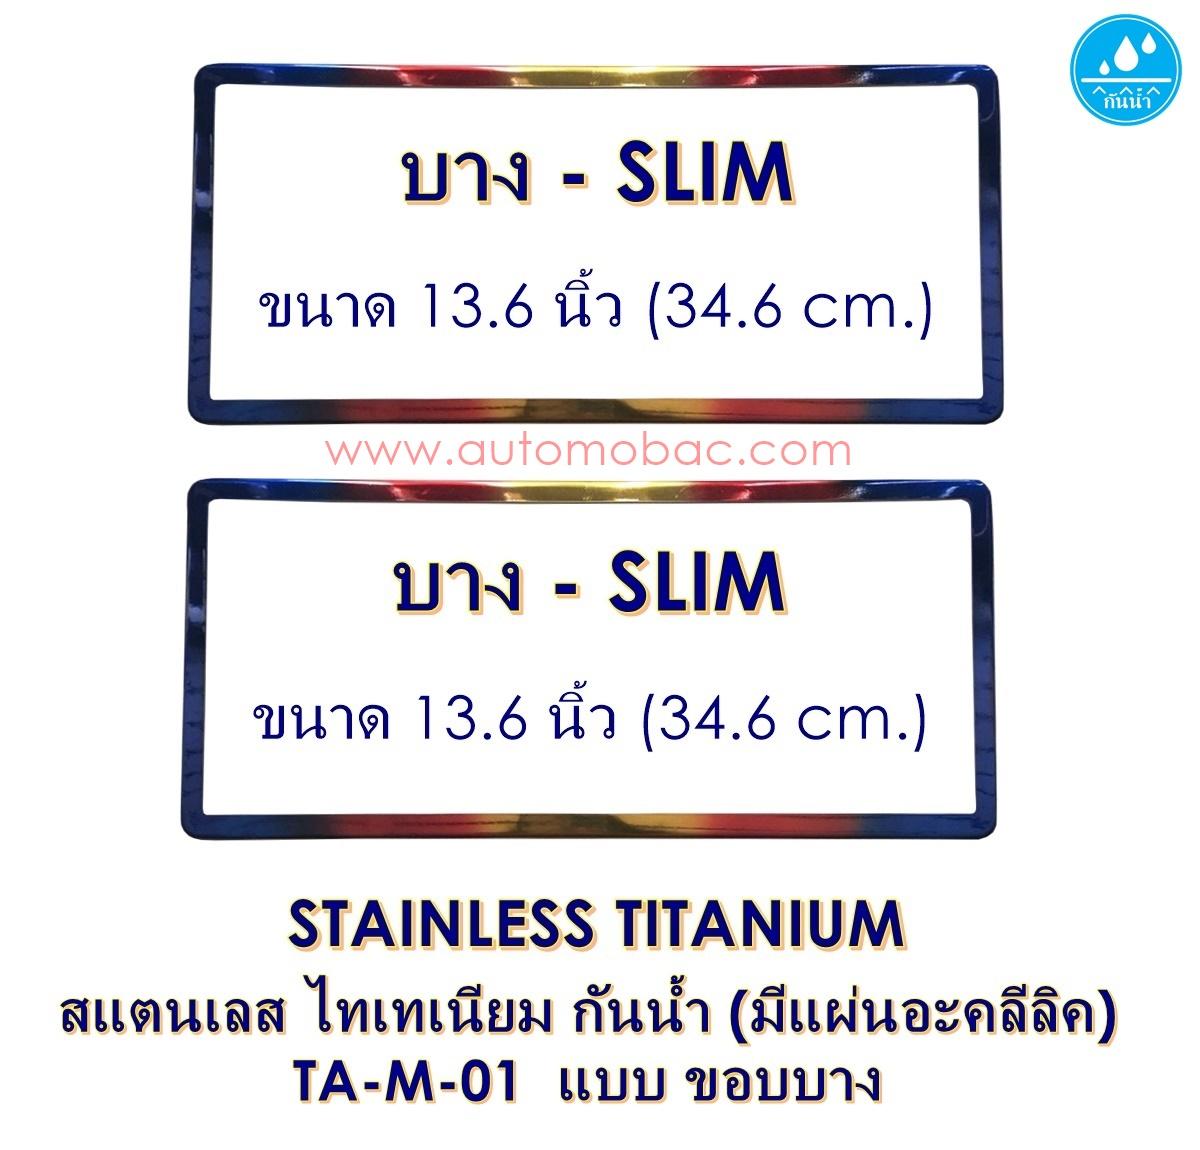 STAINLESS TITANIUM กรอบป้ายกันน้ำ TA-M-01 SLIM ขอบบาง 2 ชิ้น สแตนเลส ไทเทเนียม waterproof